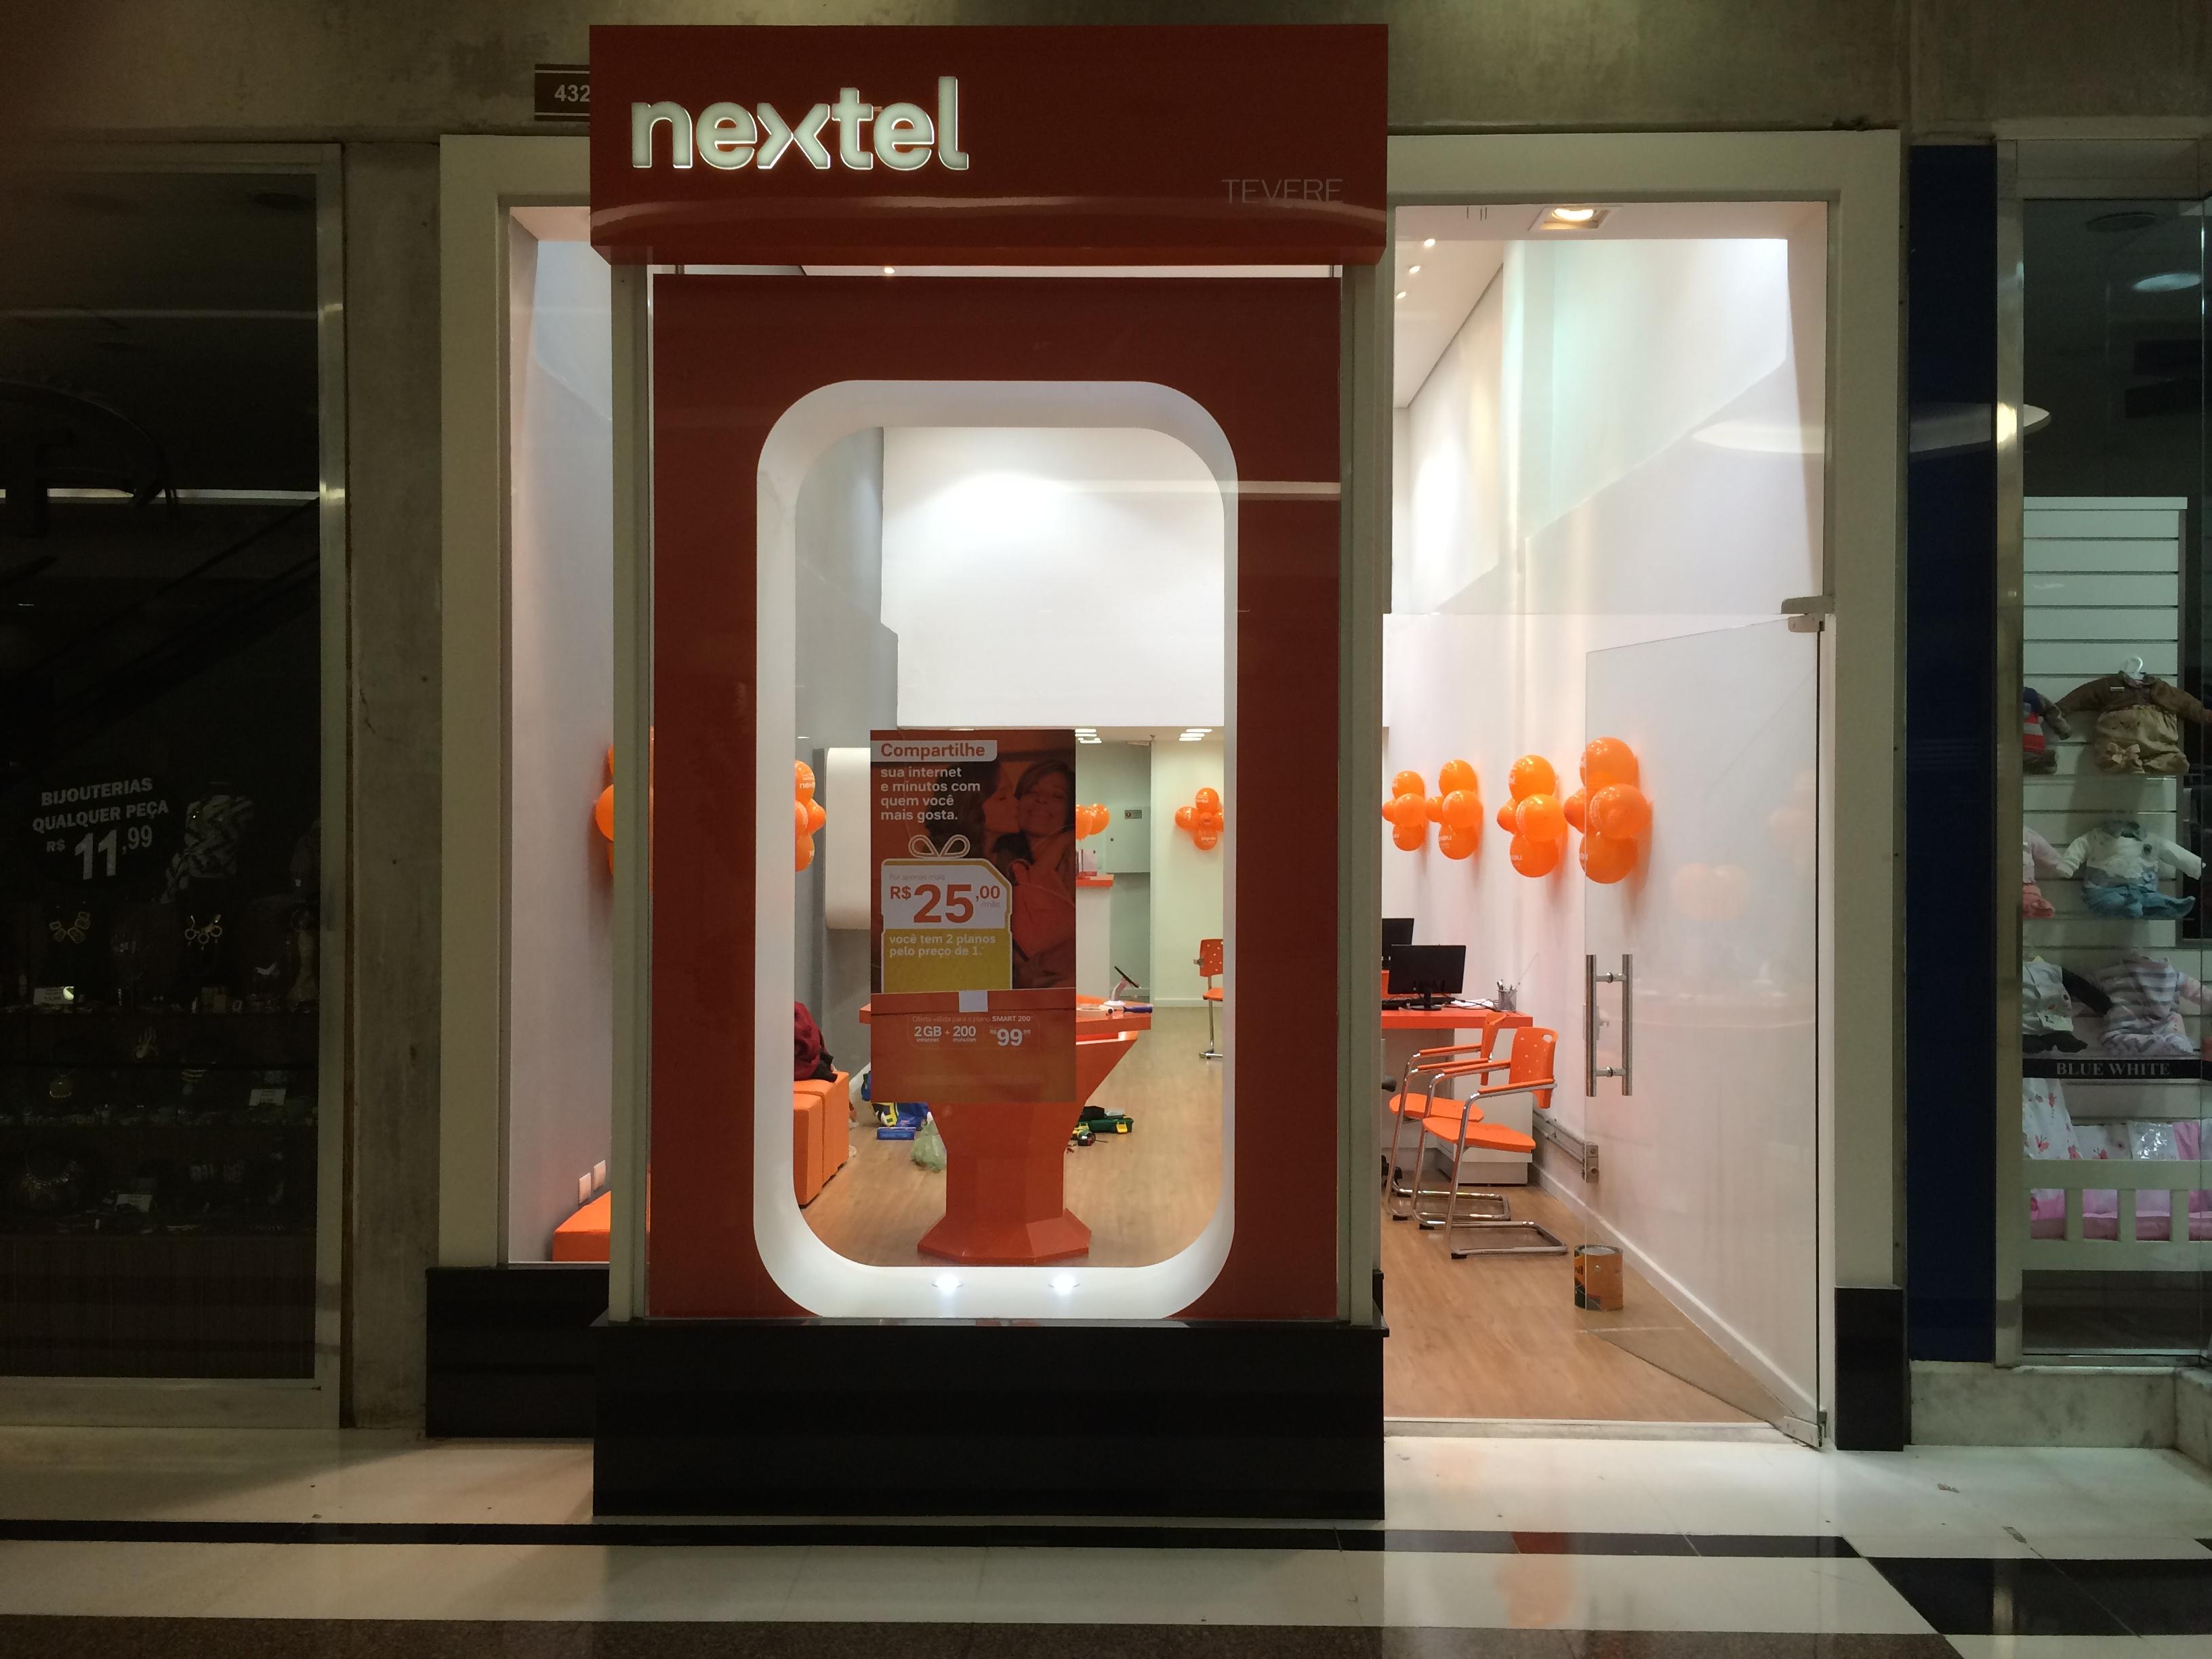 Nextel Tevere